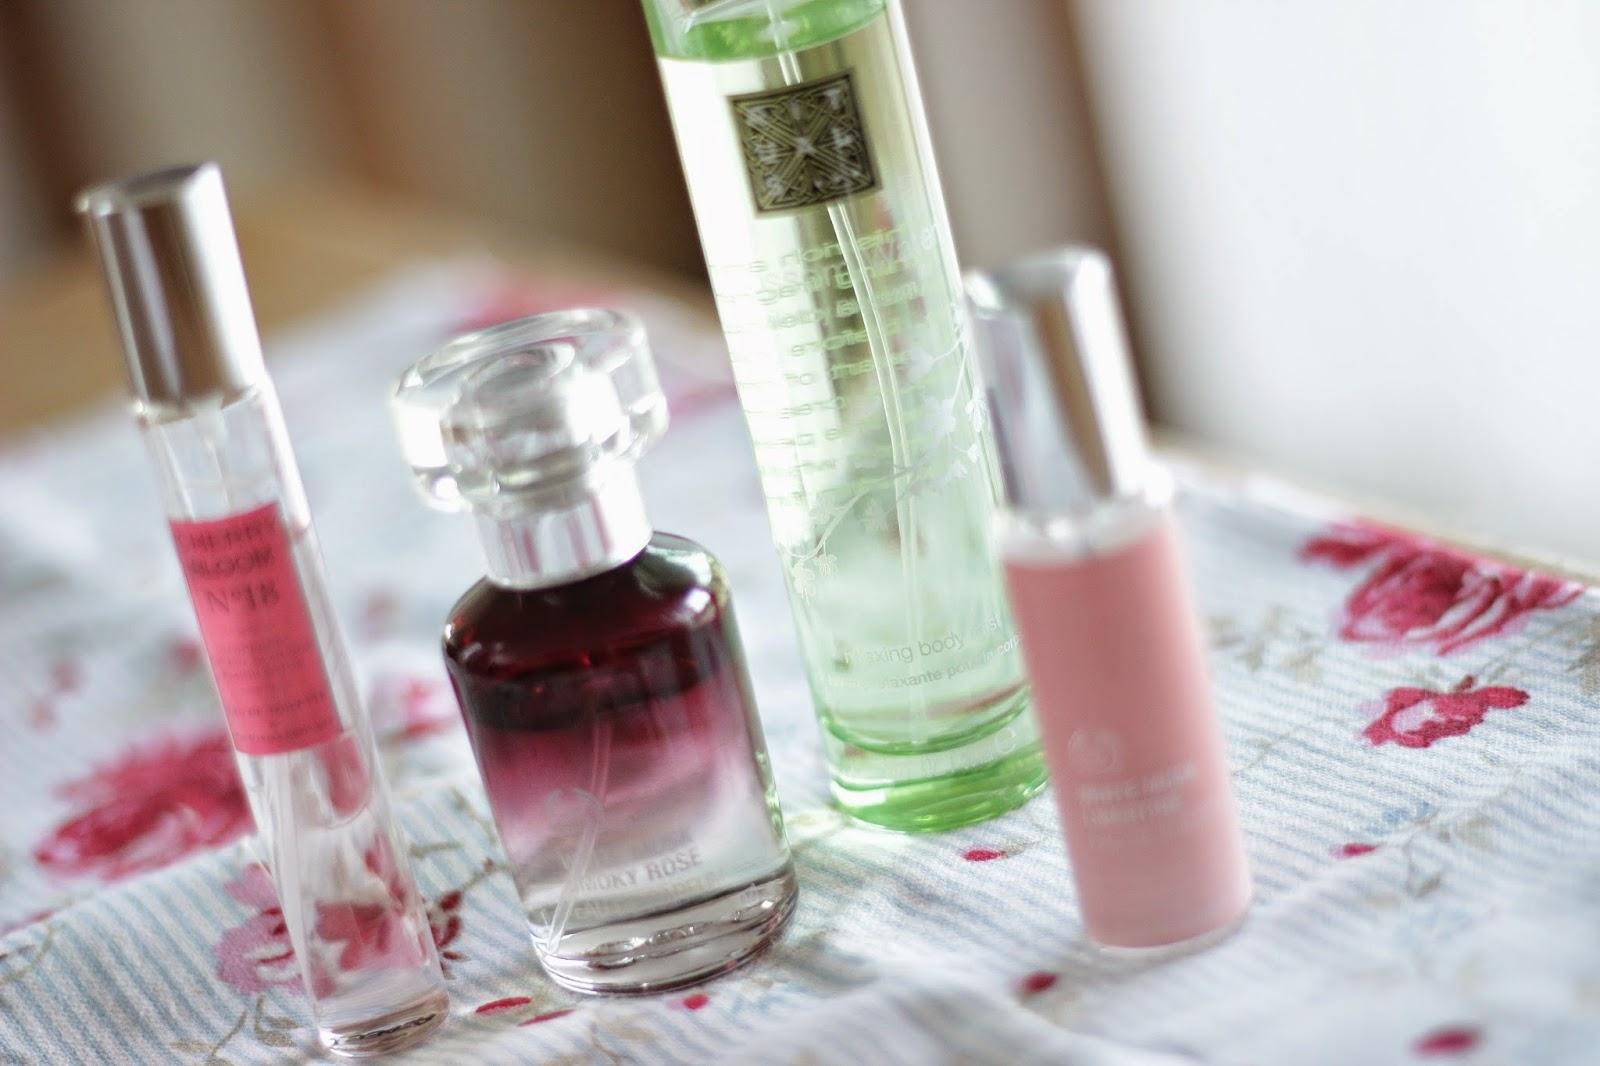 parfums geurtjes herfst winter